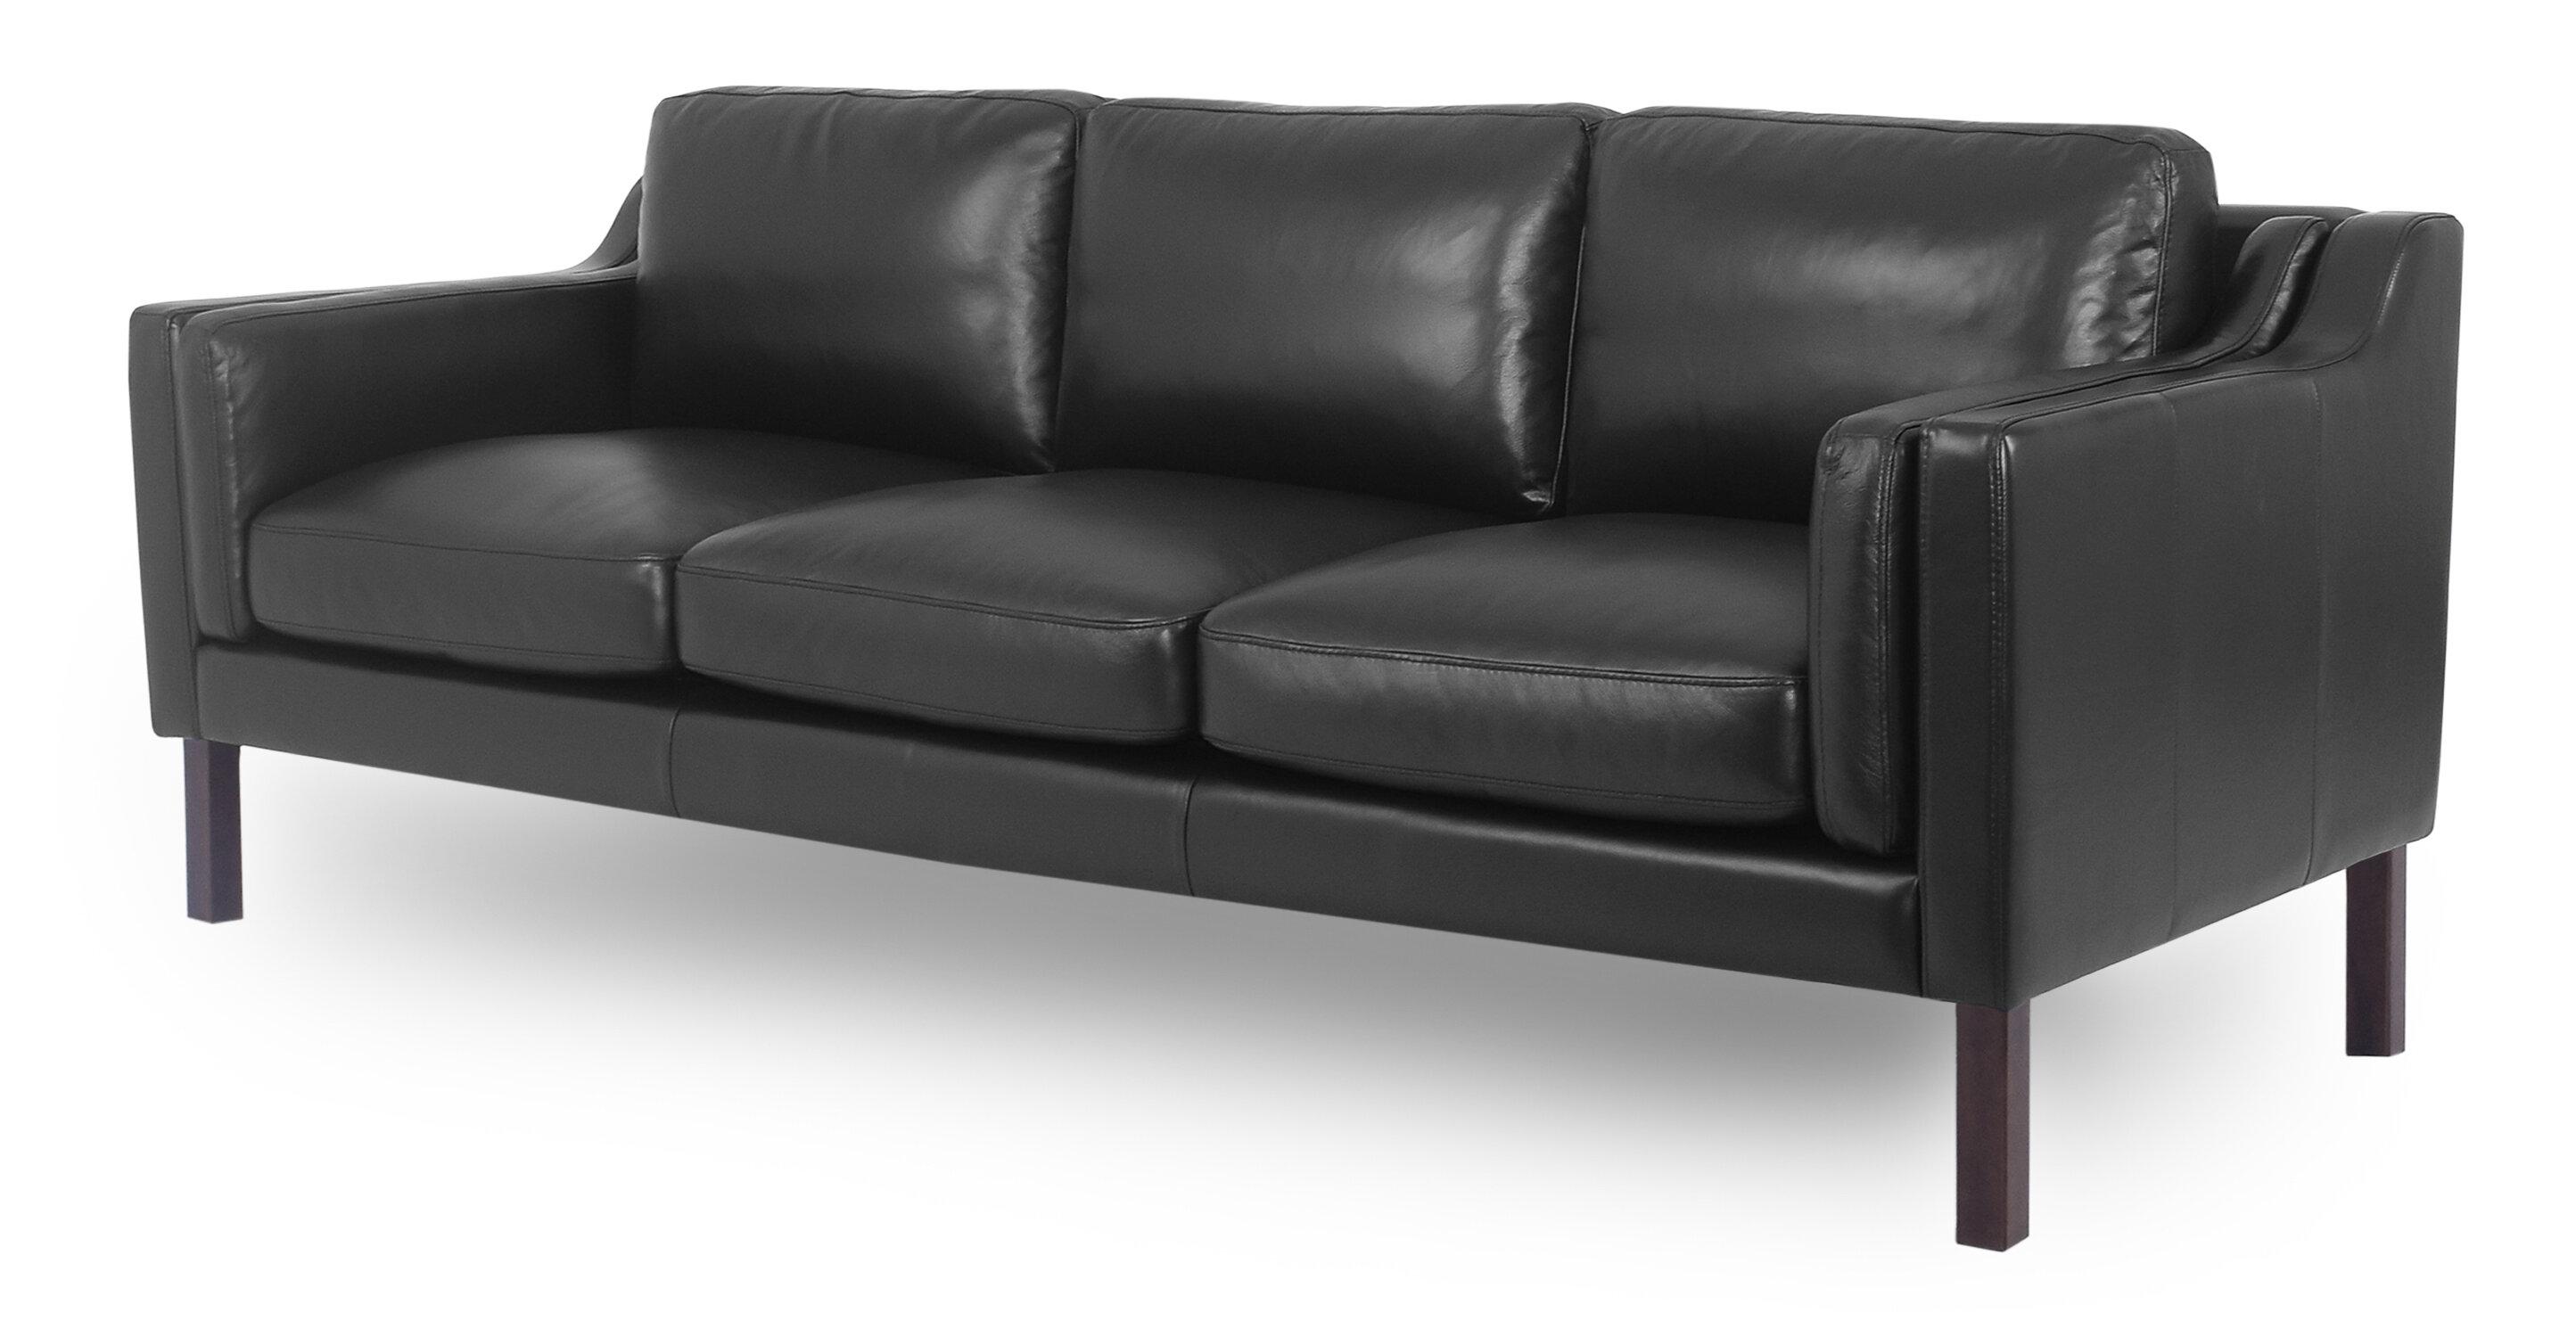 Rolando Mid Century Leather Sofa